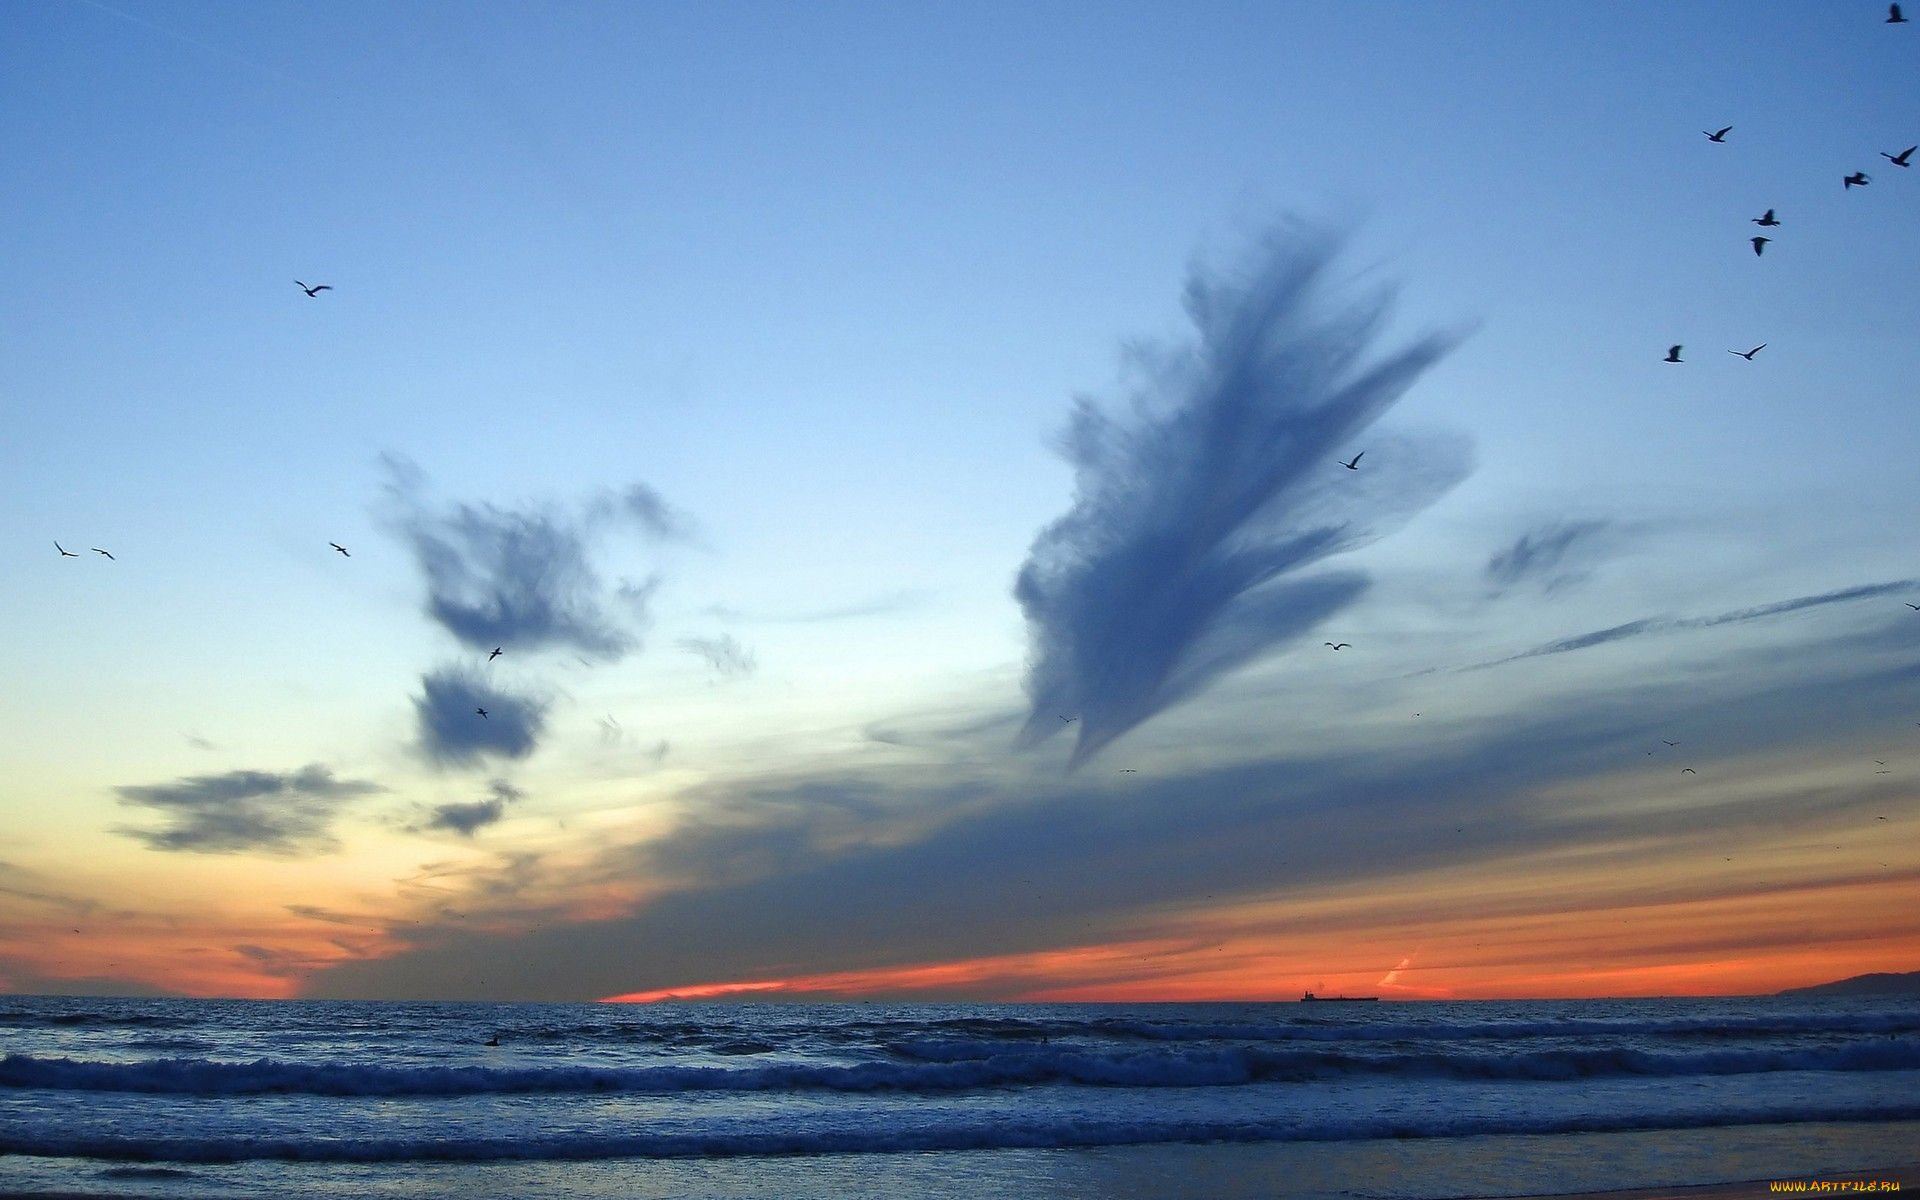 природа море горизонт небо облака nature sea horizon the sky clouds бесплатно